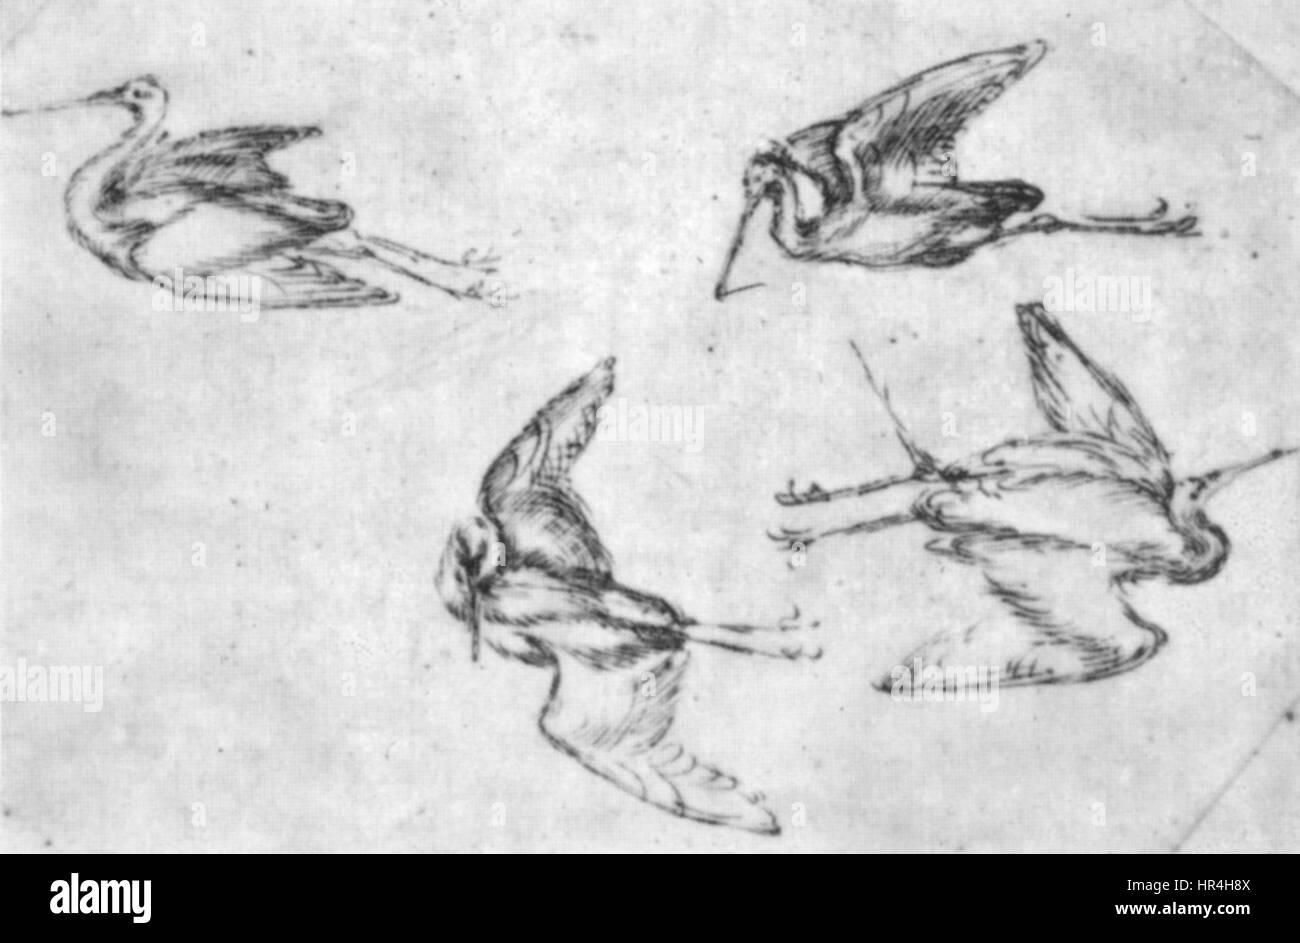 Pisanello, disegni, louvre 2469 - Stock Image